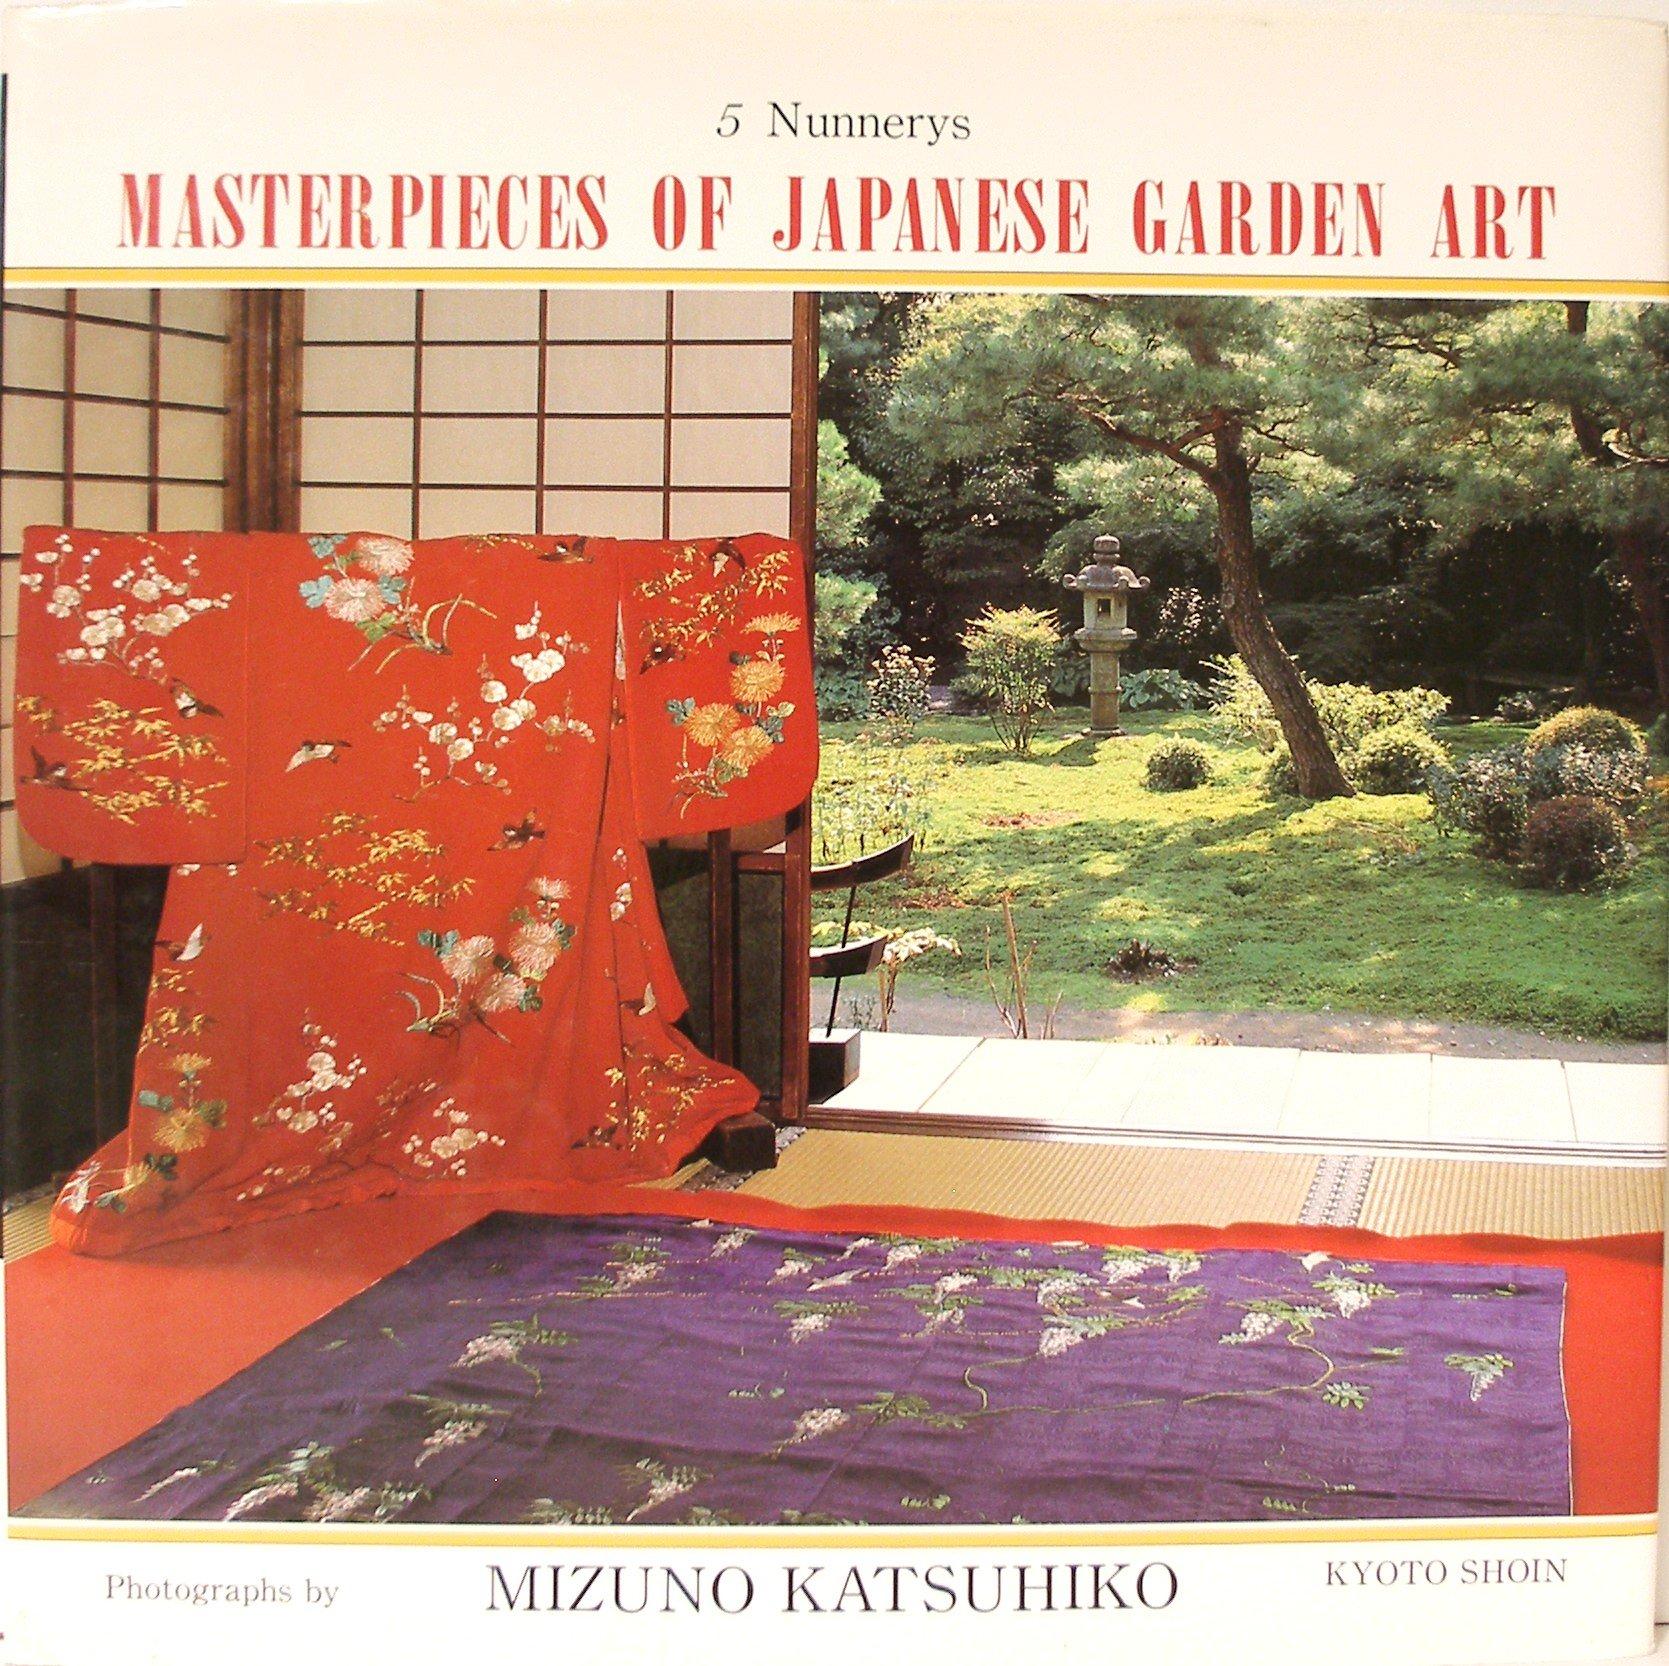 Masterpieces of Japanese Garden Art: Nunnerys